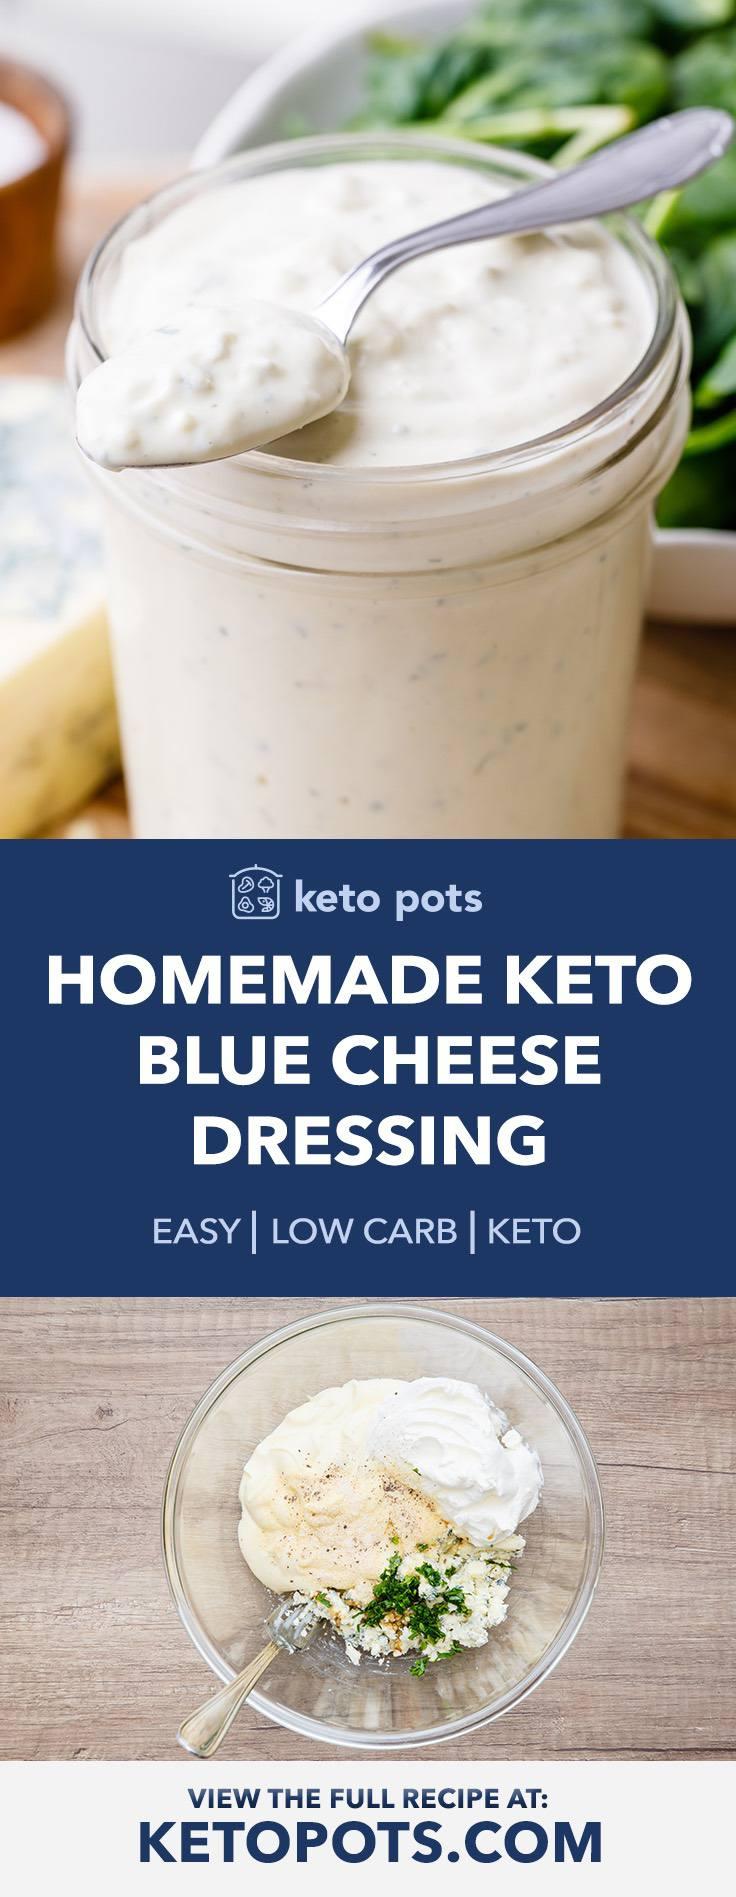 Creamy Homemade Keto Blue Cheese Dressing